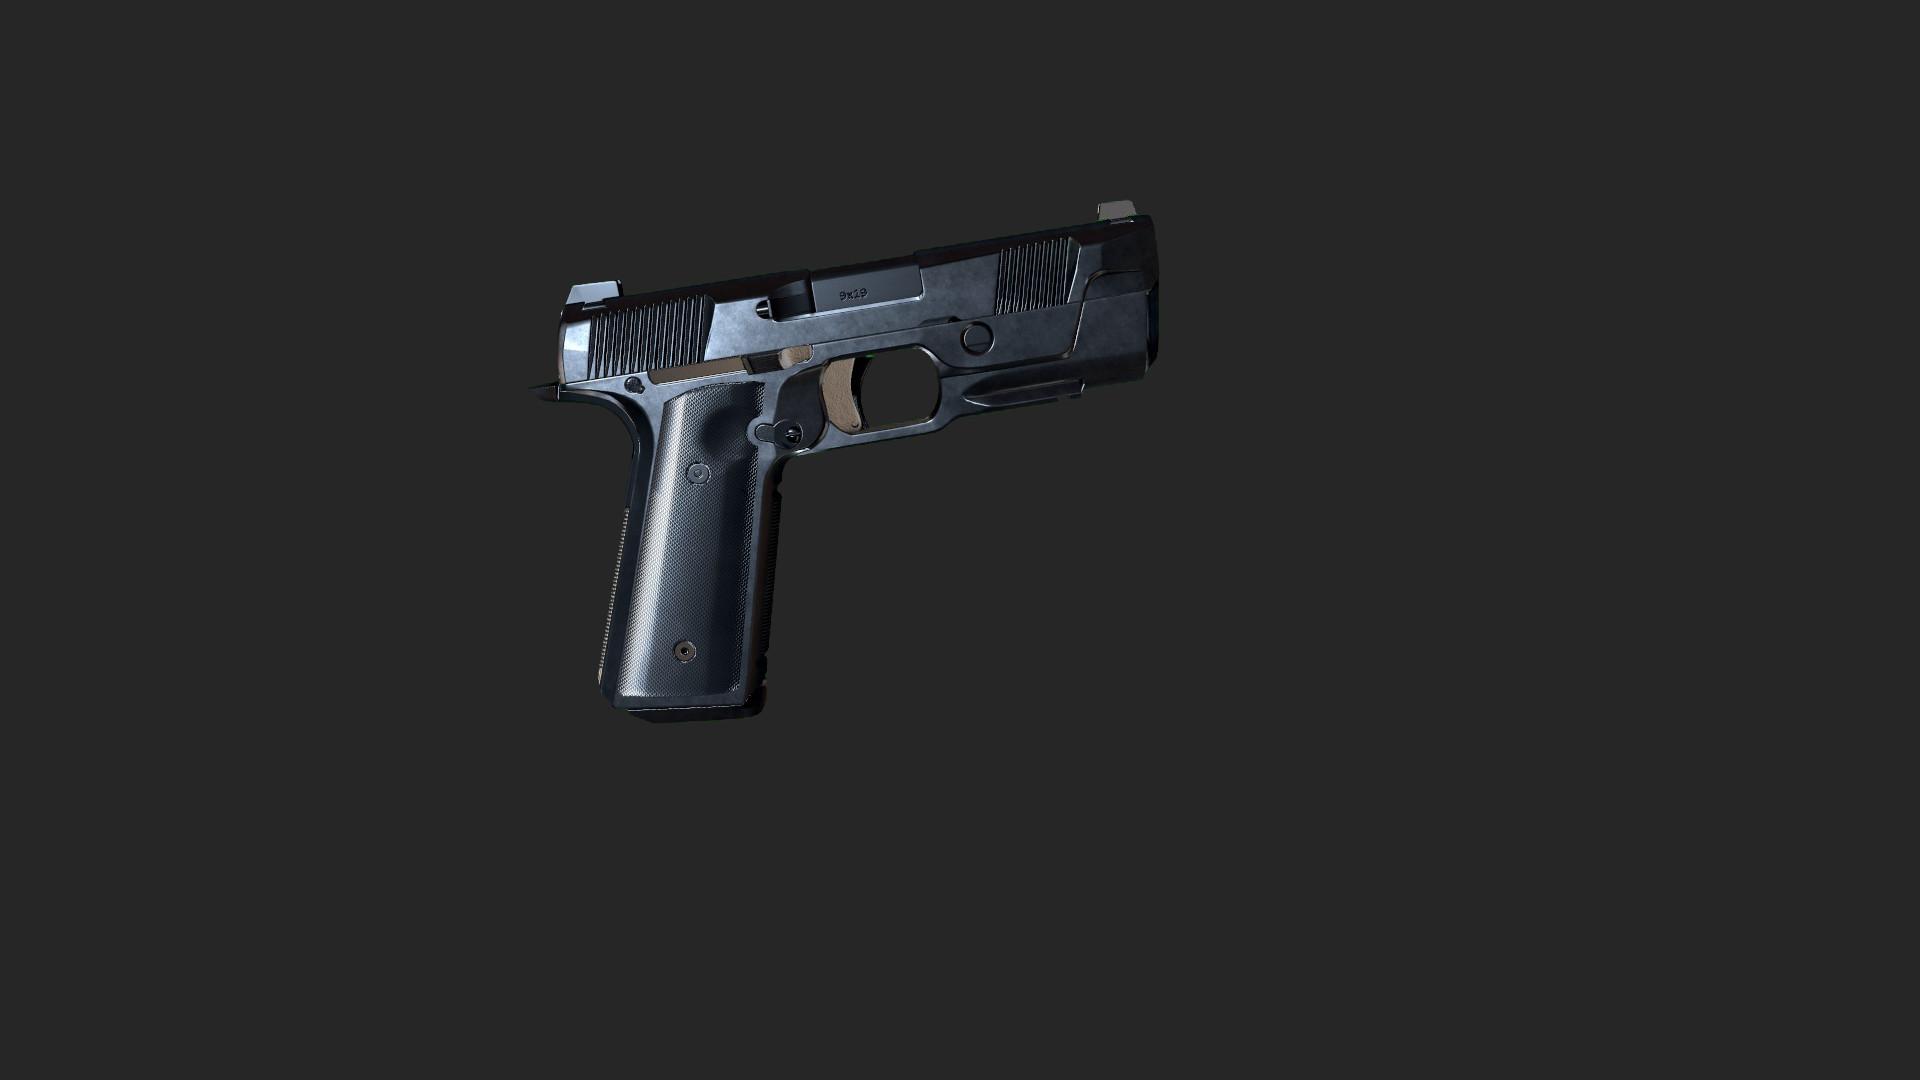 PAYDAY 2: Fugitive Weapon Pack PC Key Fiyatları